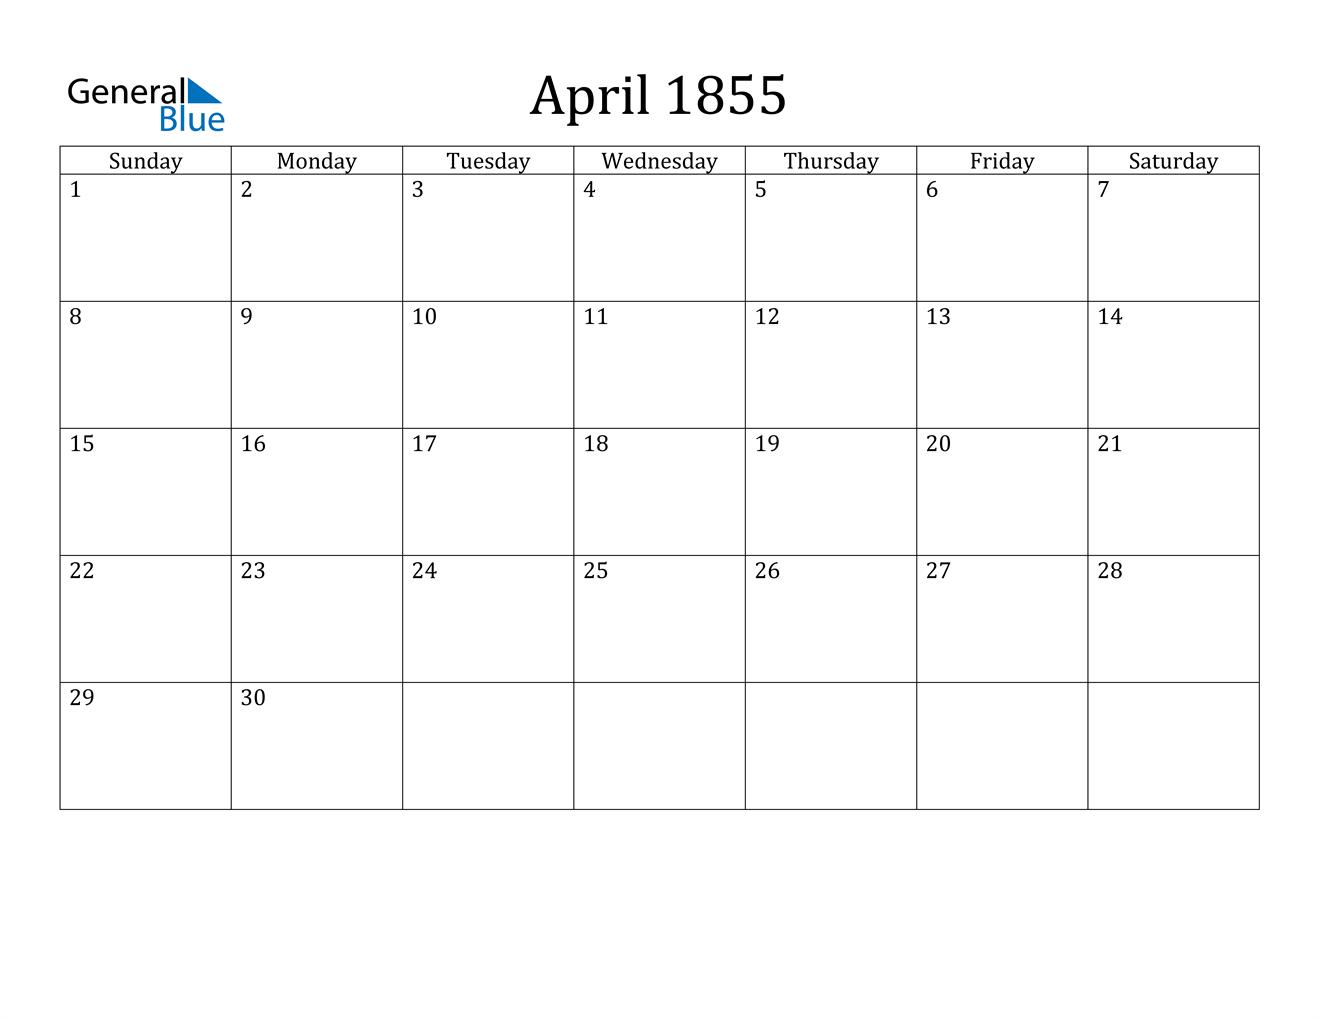 Image of April 1855 Calendar